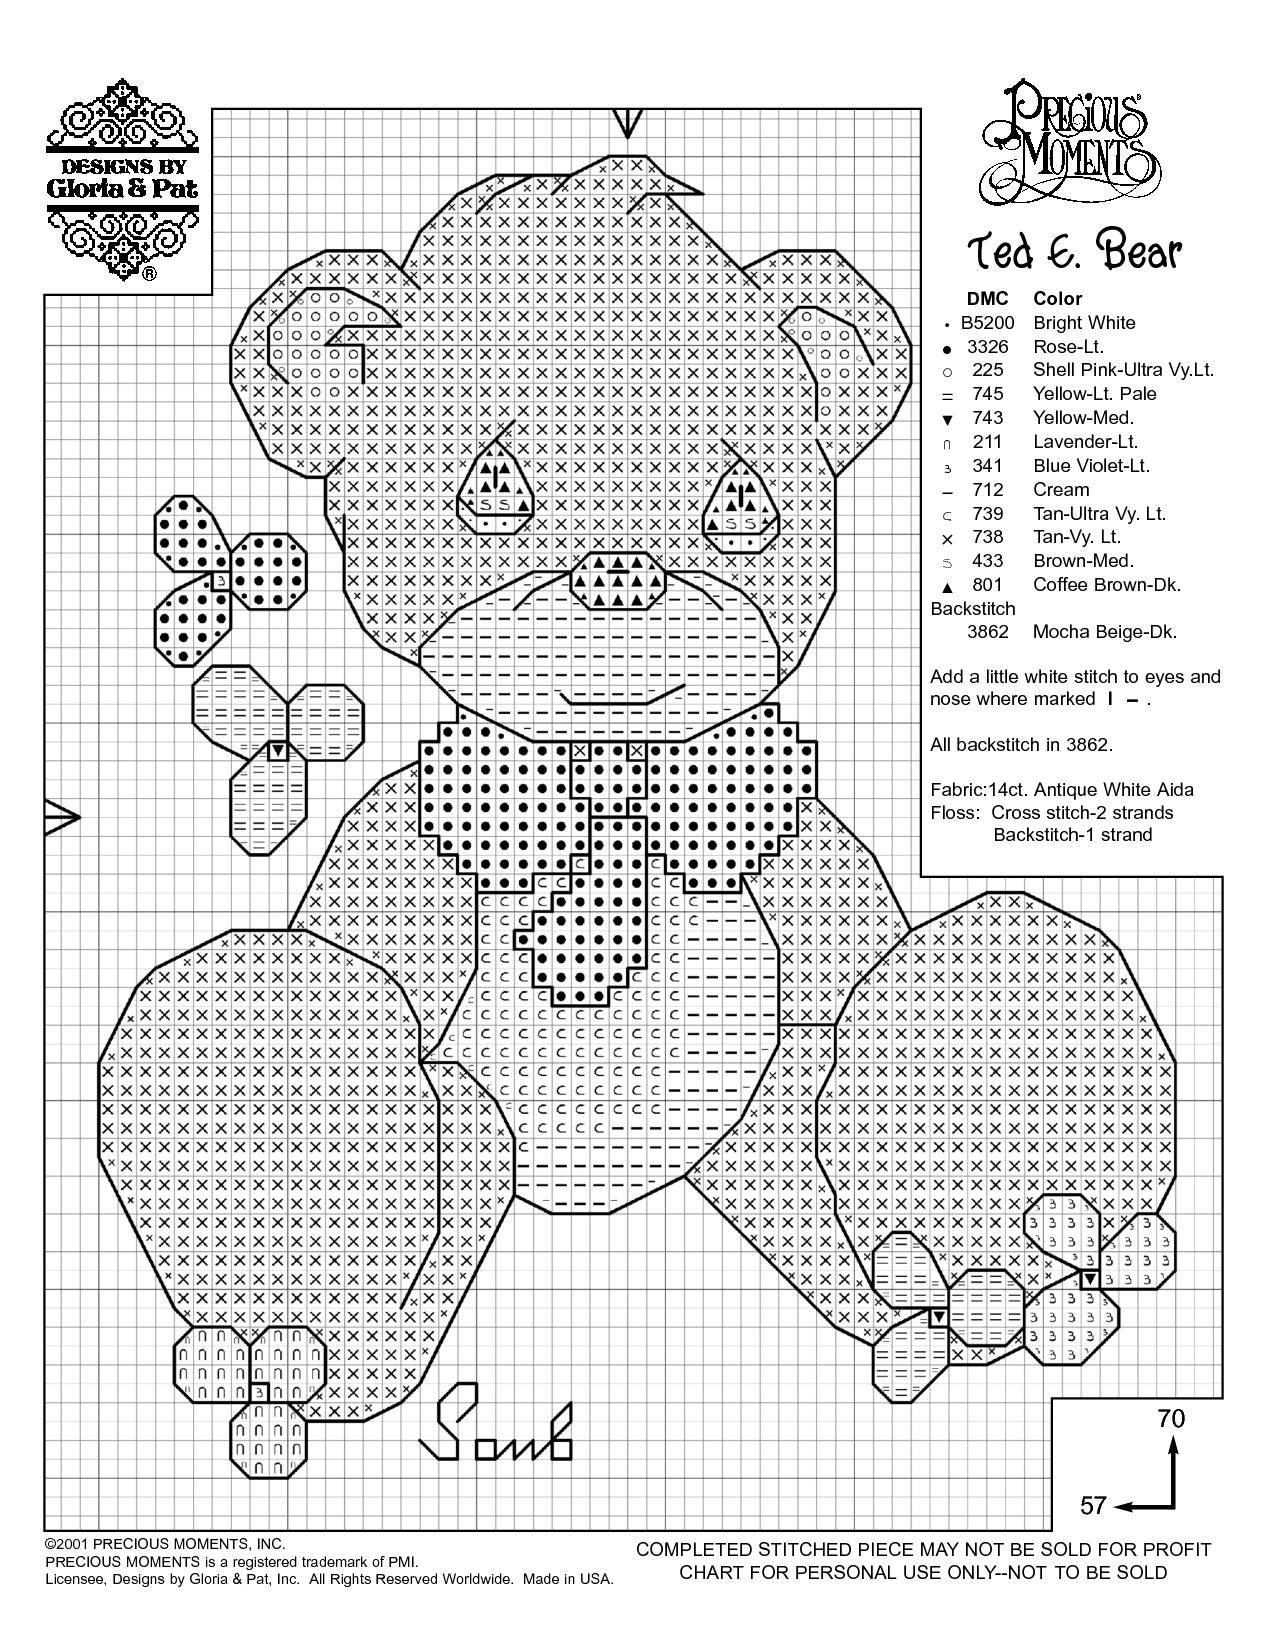 Free Printable Cross Stitch Patterns | Needlework Projects - Free Printable Cross Stitch